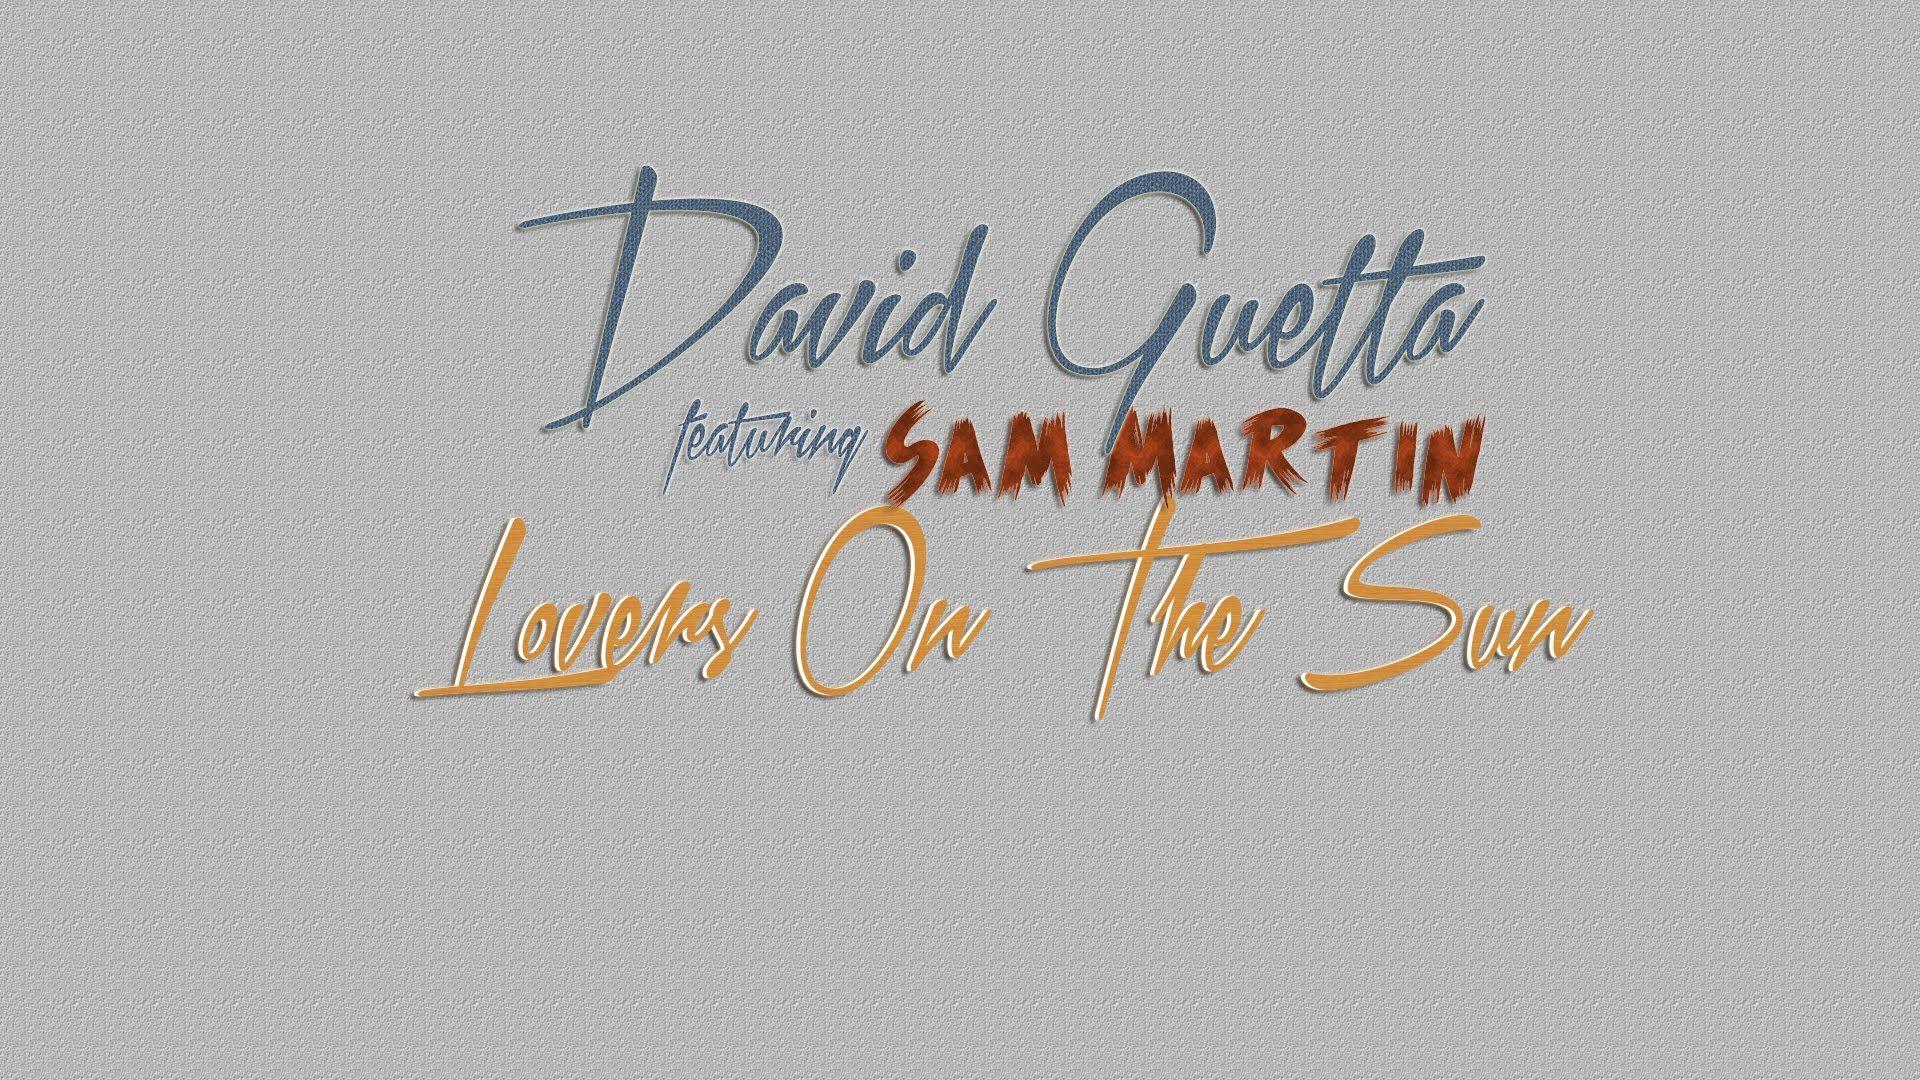 David Guetta ft. Sam Martin - Lovers On The Sun (Lyrics)